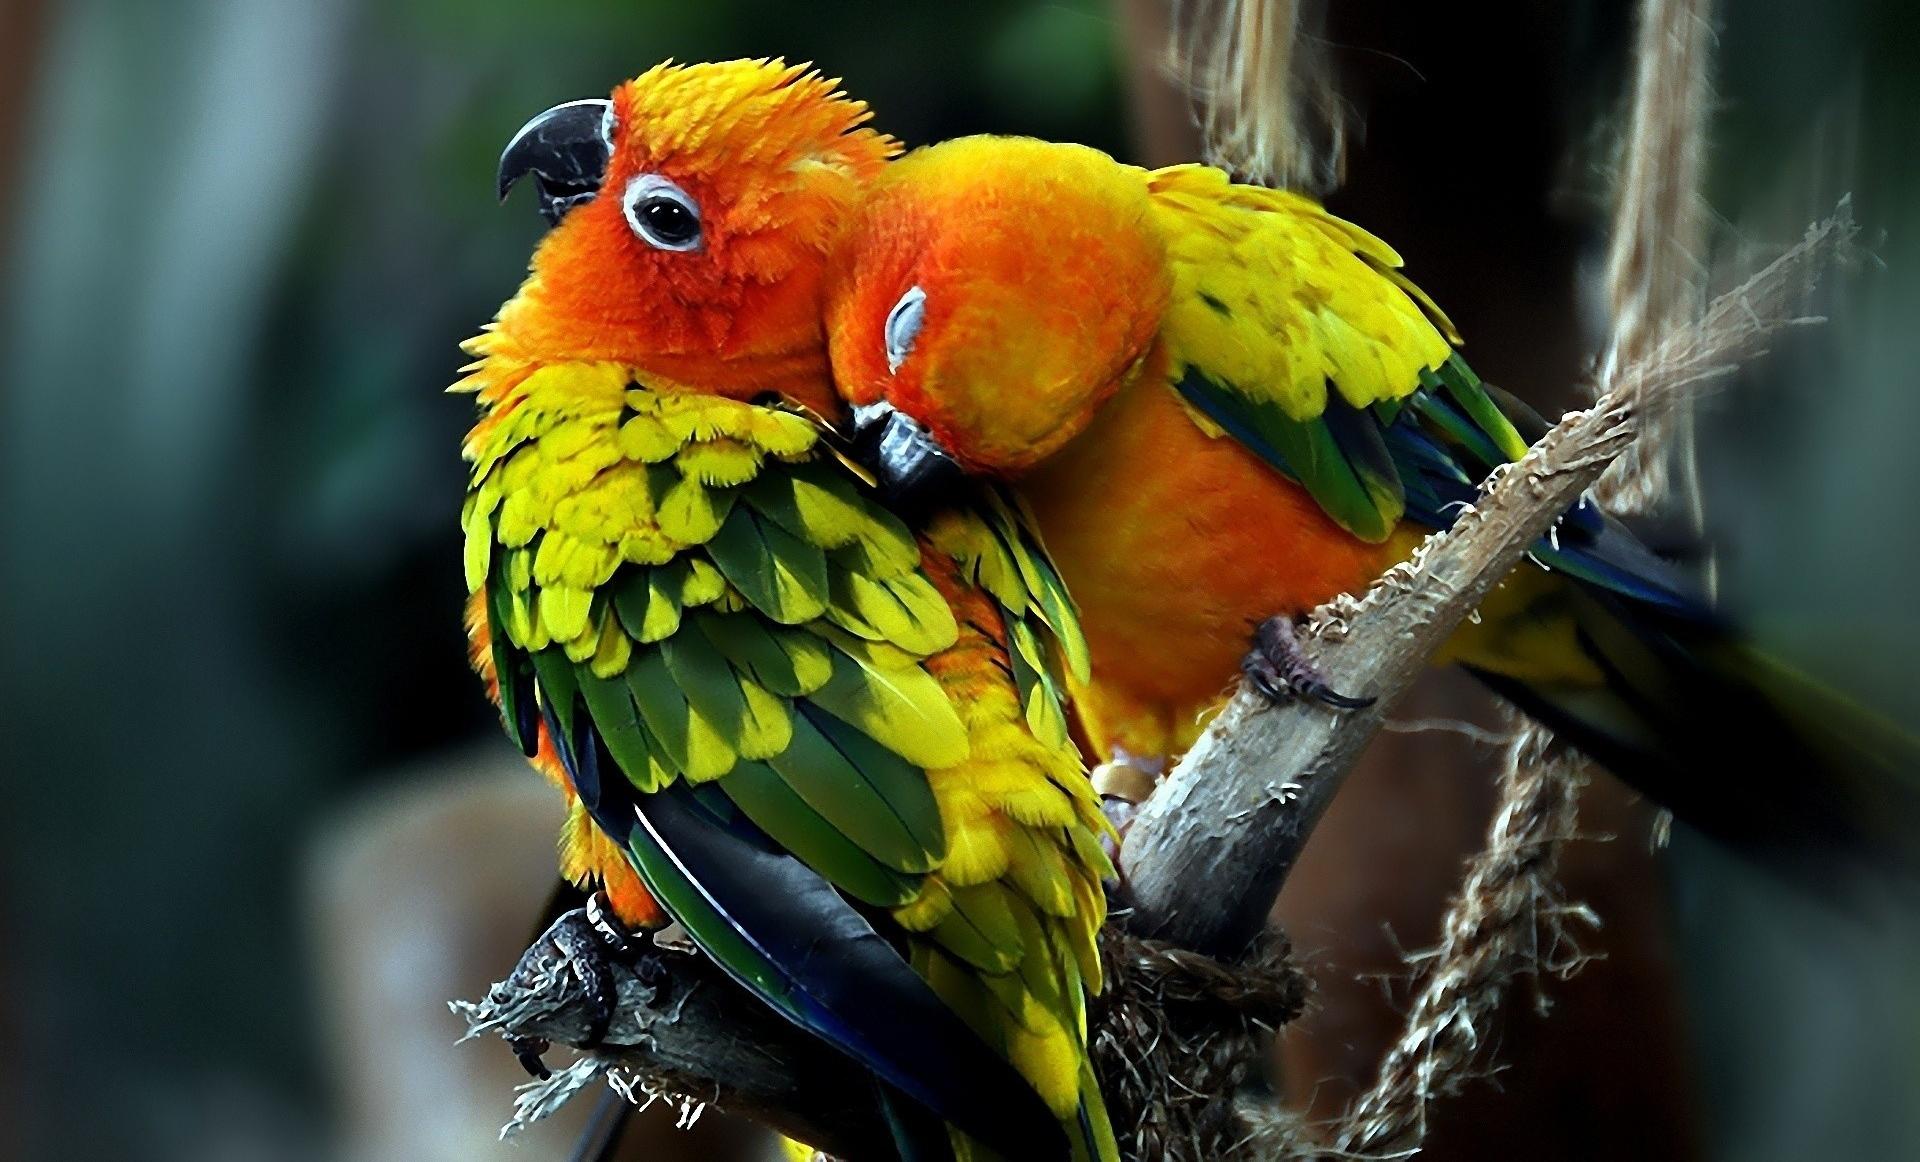 Beautiful Parrots birds HD Wallpaper 1920x1162